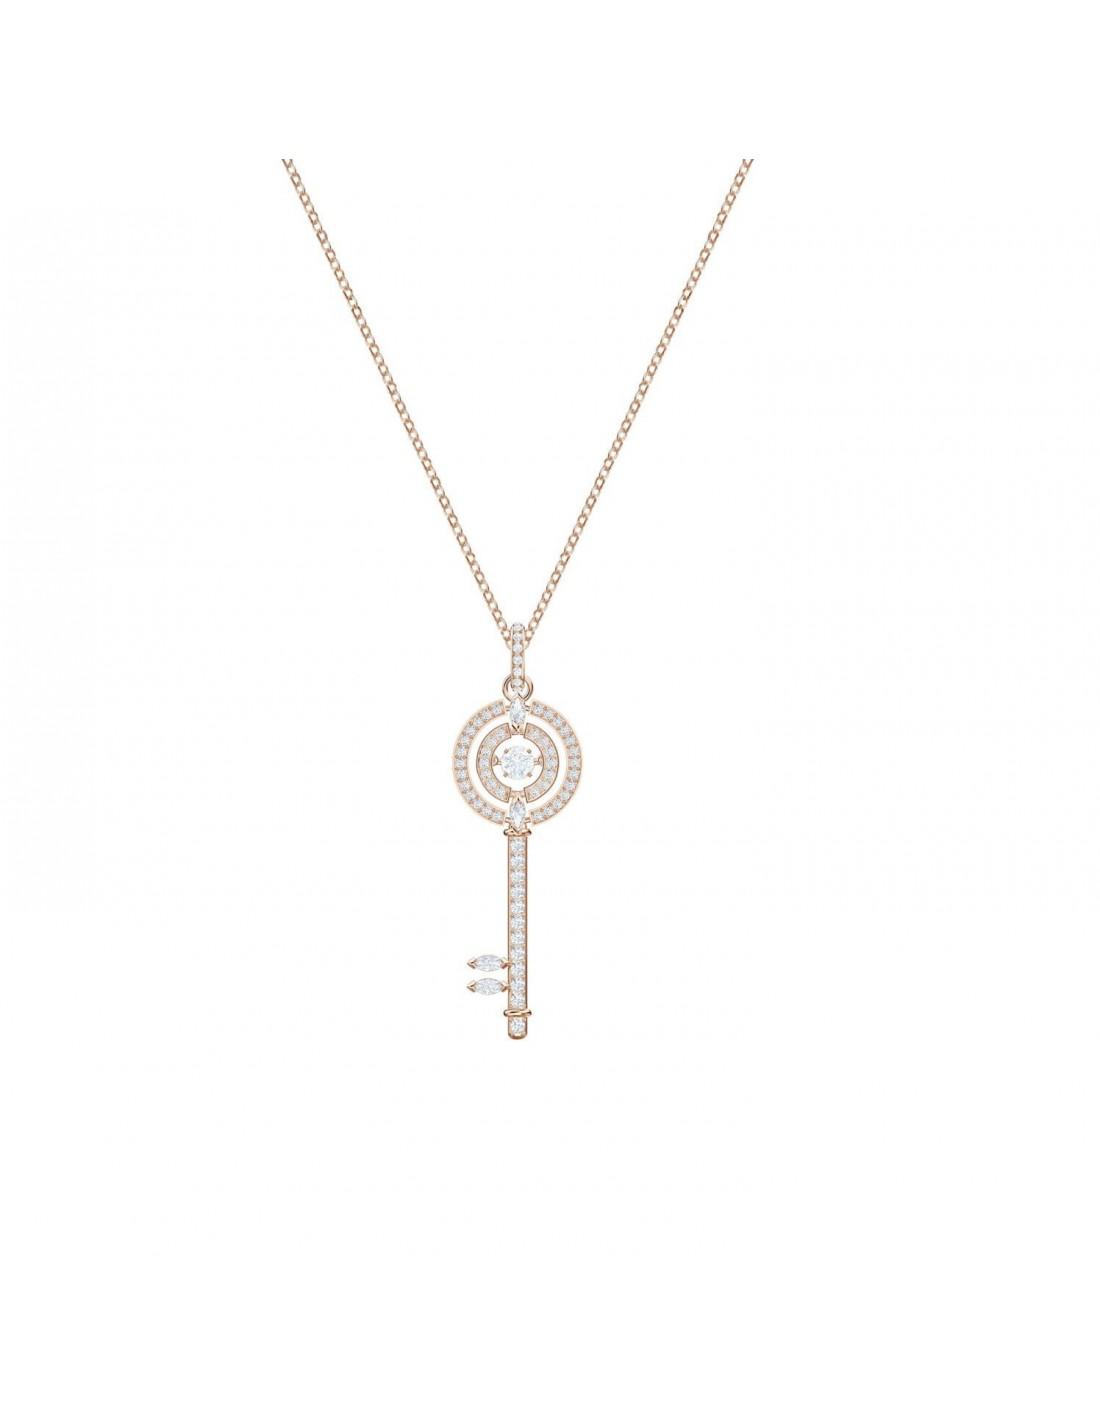 293a2fd4da47b Pendant Sparkling Dance Key Swarovski jewelry rose gold plated 5469120